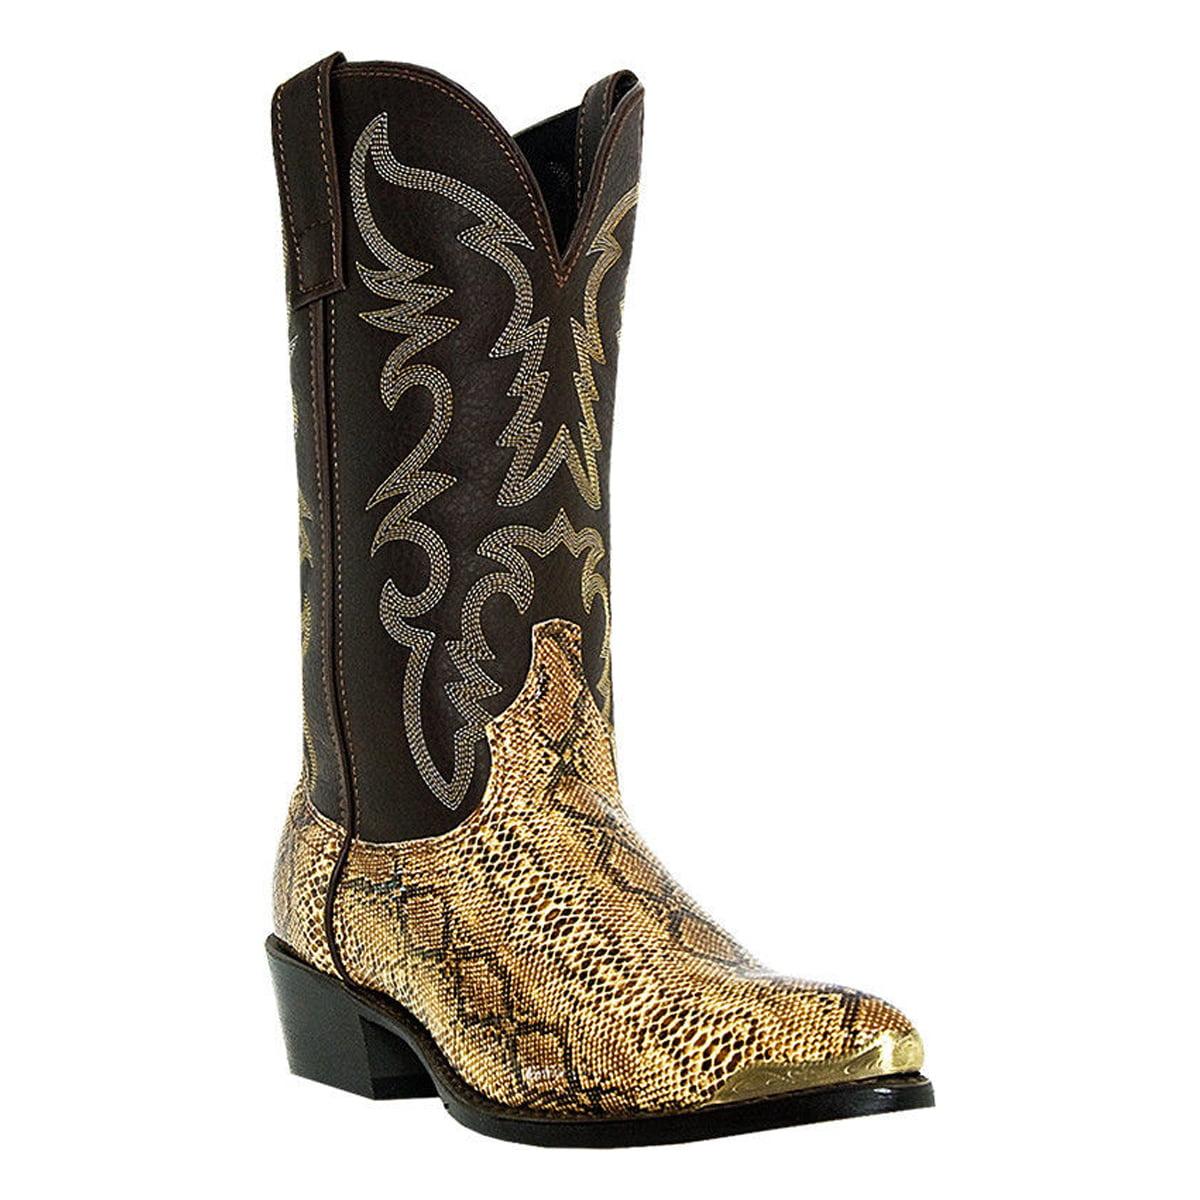 Laredo Western Boots Mens Cowboy Monty Faux Snake Golden Copper 68068 by Laredo